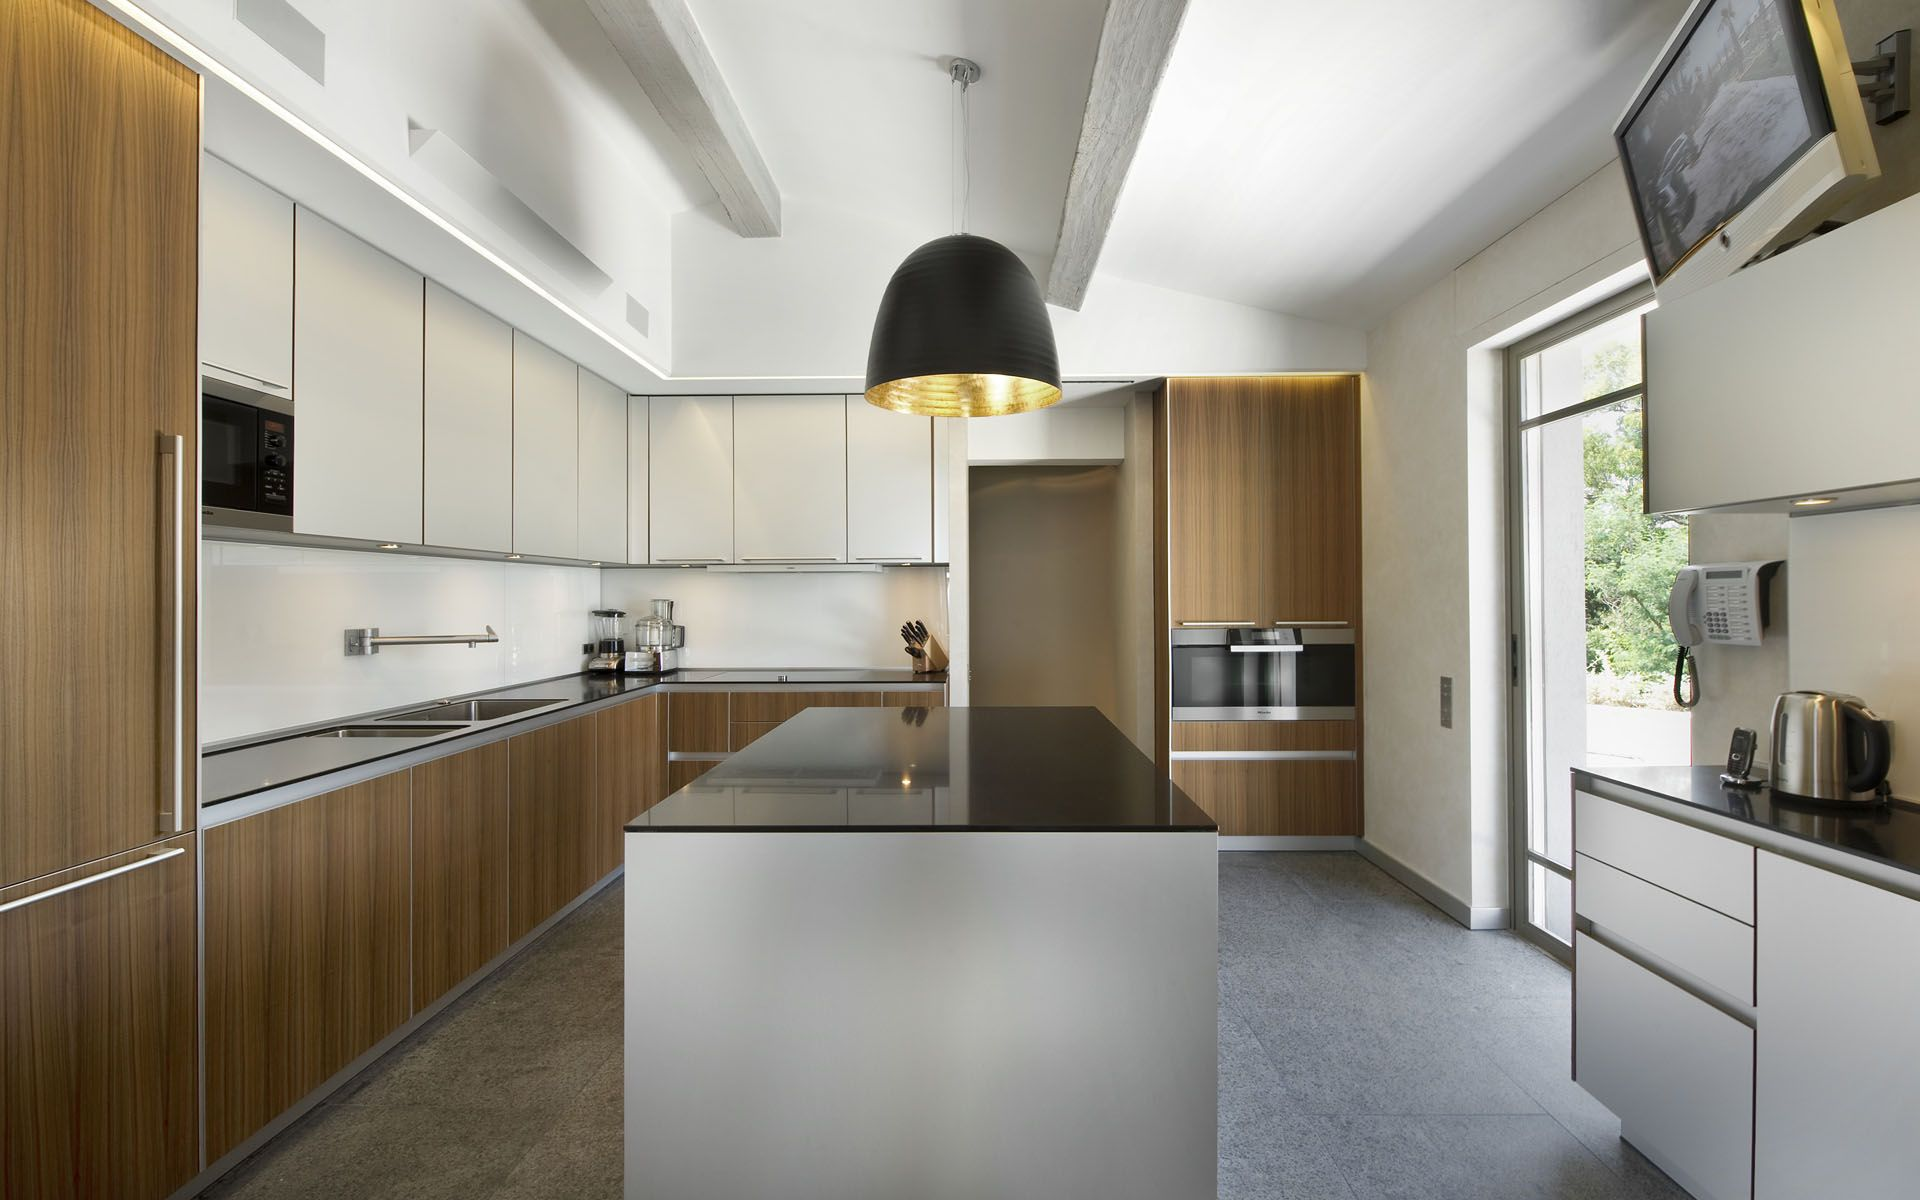 25 amazing minimalist kitchen design ideas minimalist kitchen interiors minimalist kitchen on kitchen ideas minimalist id=92133